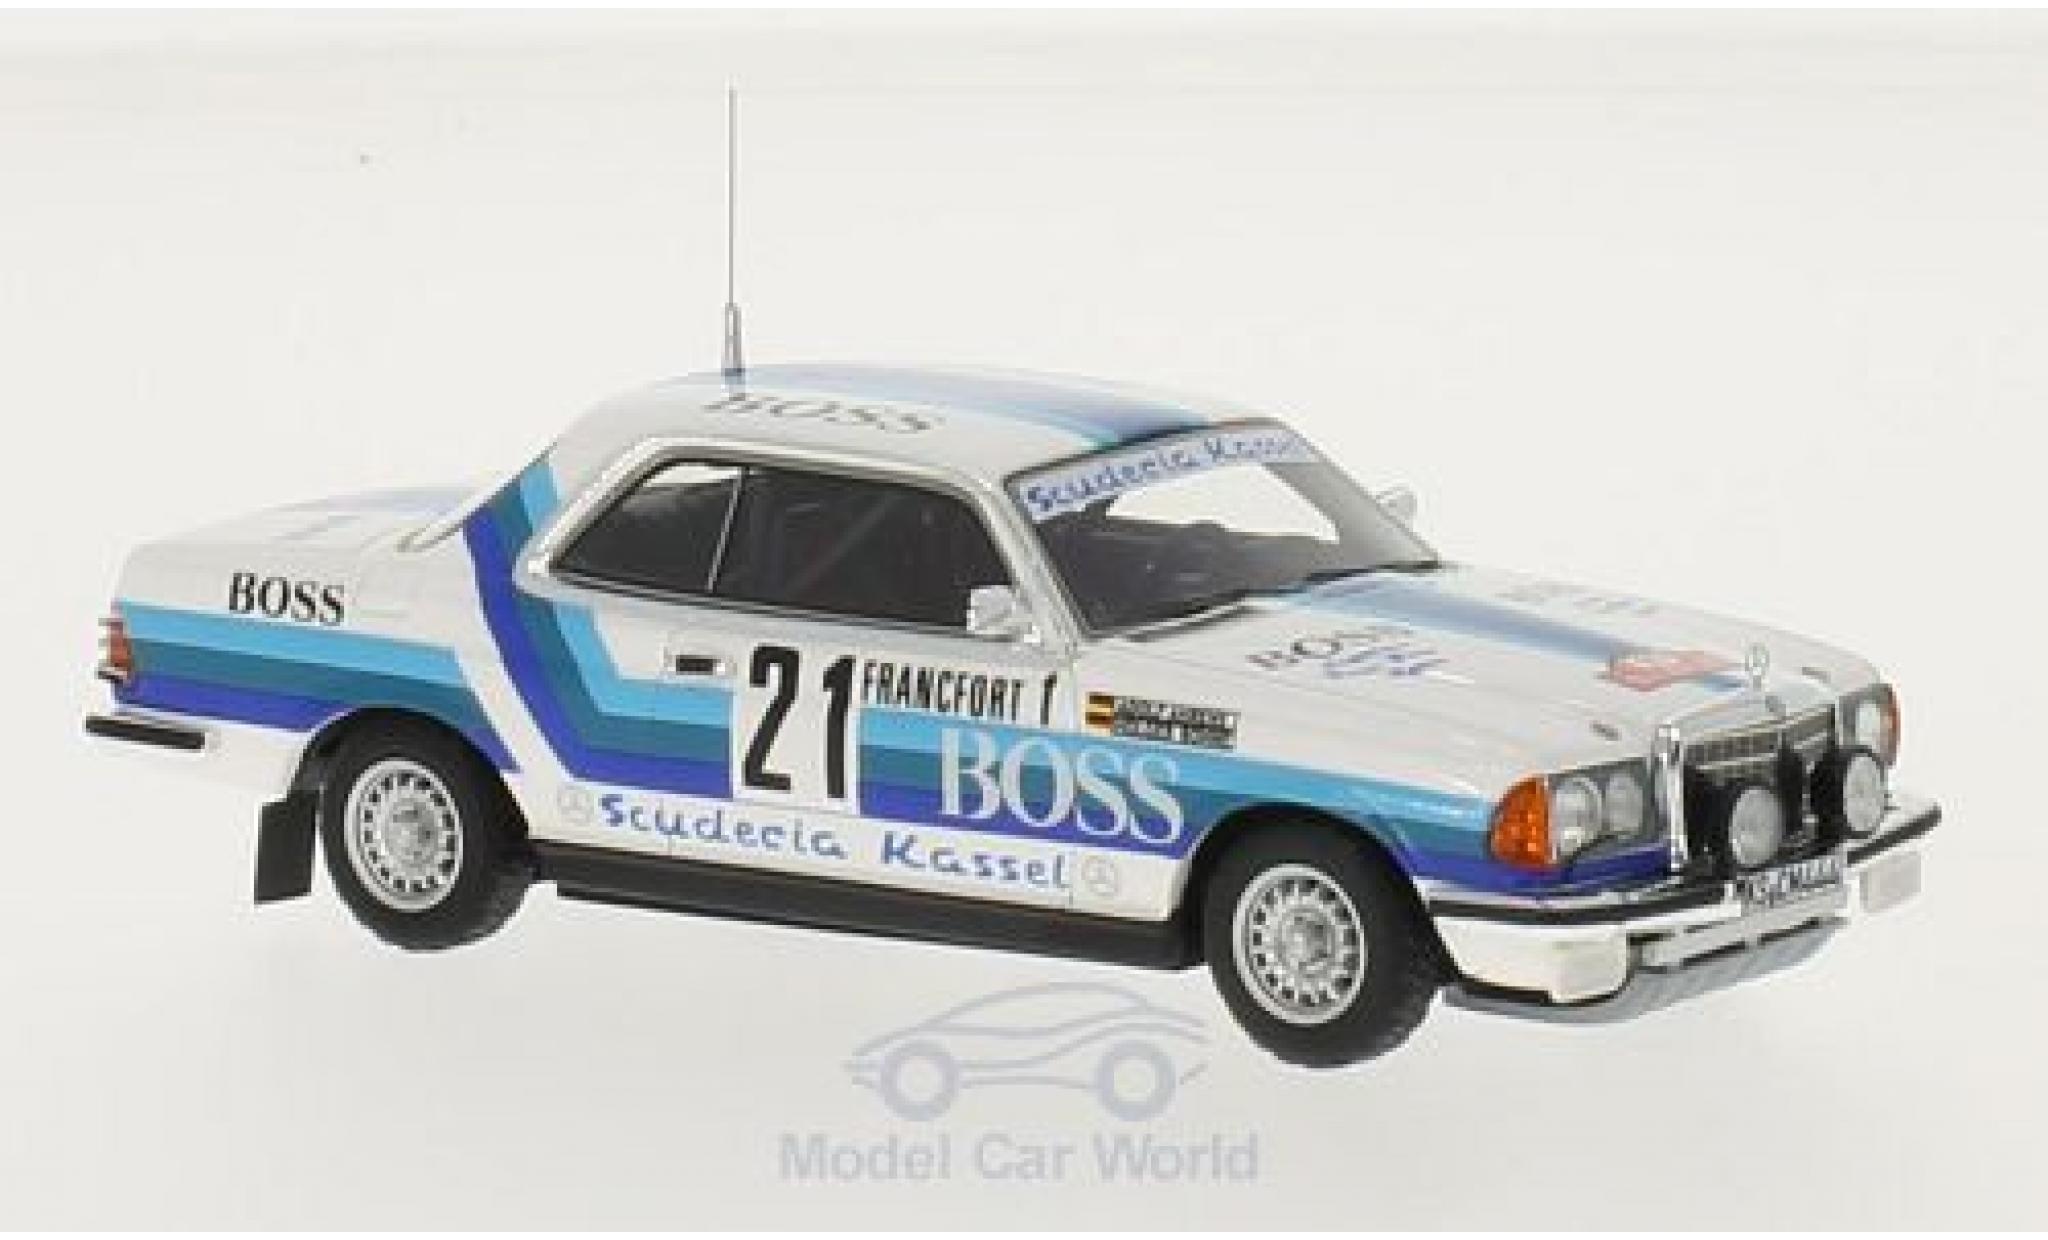 Mercedes 280 1980 1/43 Neo CE No.21 Boss Rallye WM Rallye Monte Carlo 1980 H.Bohne/A.Ahrens